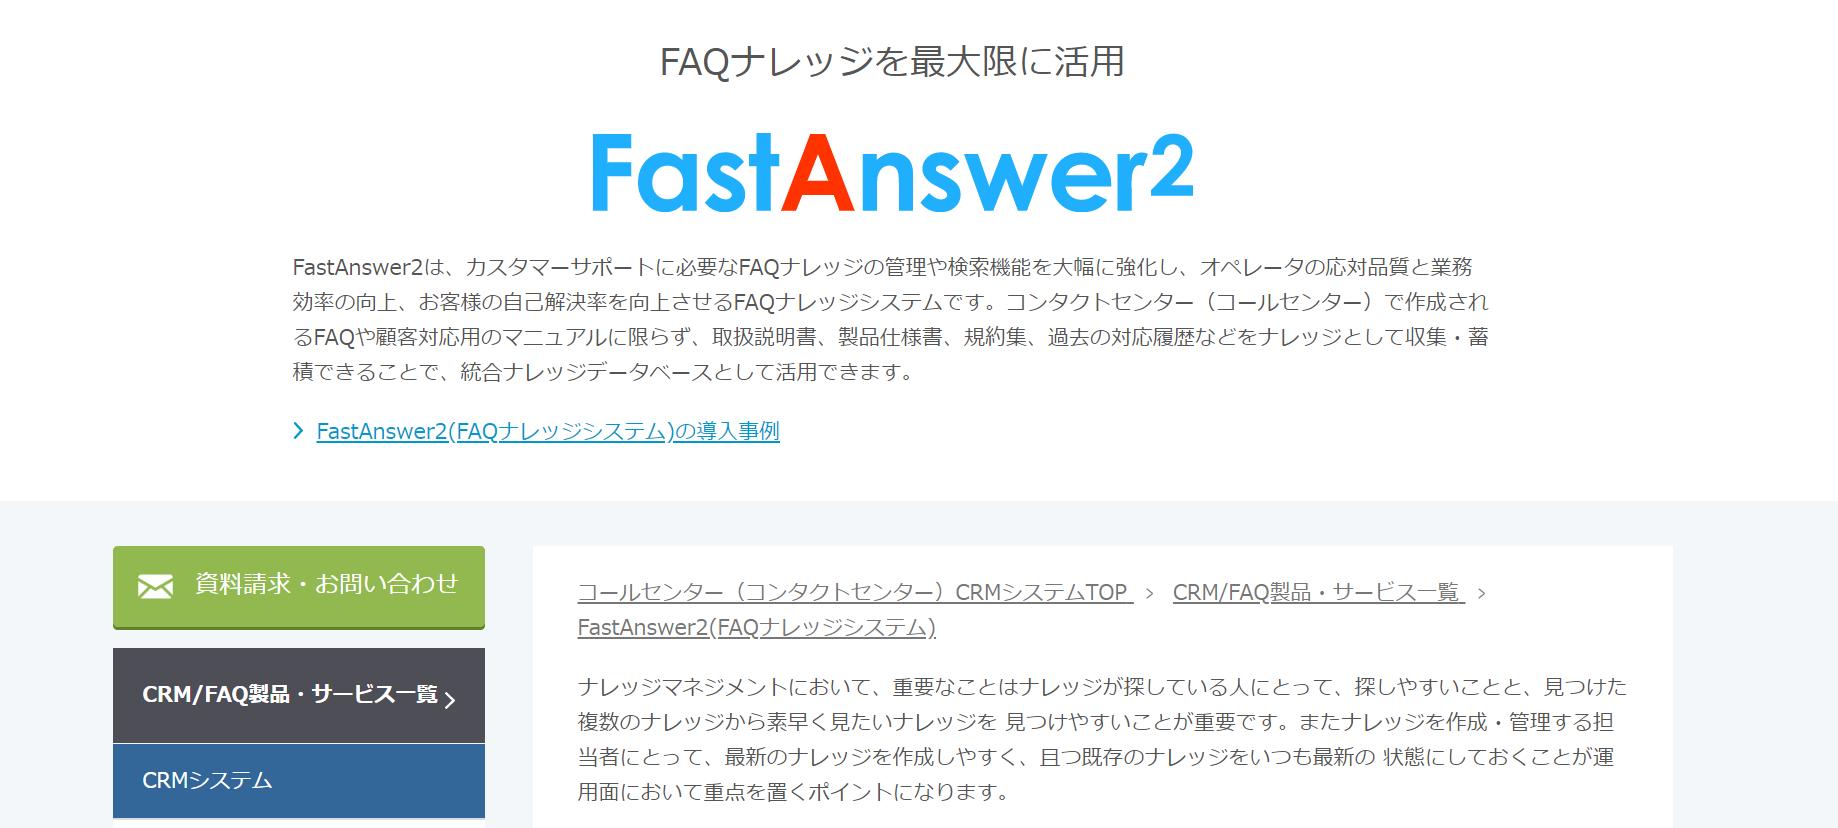 FAQツール2「FastAnswer2」